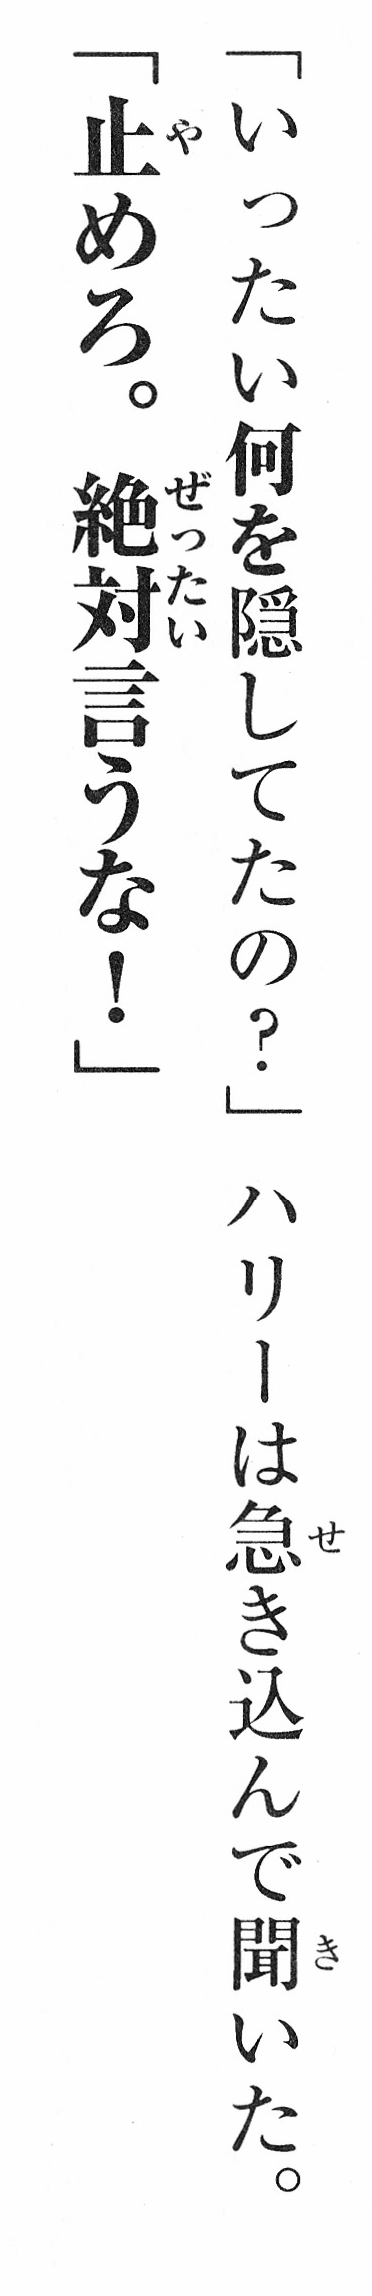 6_太字_強調_賢者の石_p78_.jpg